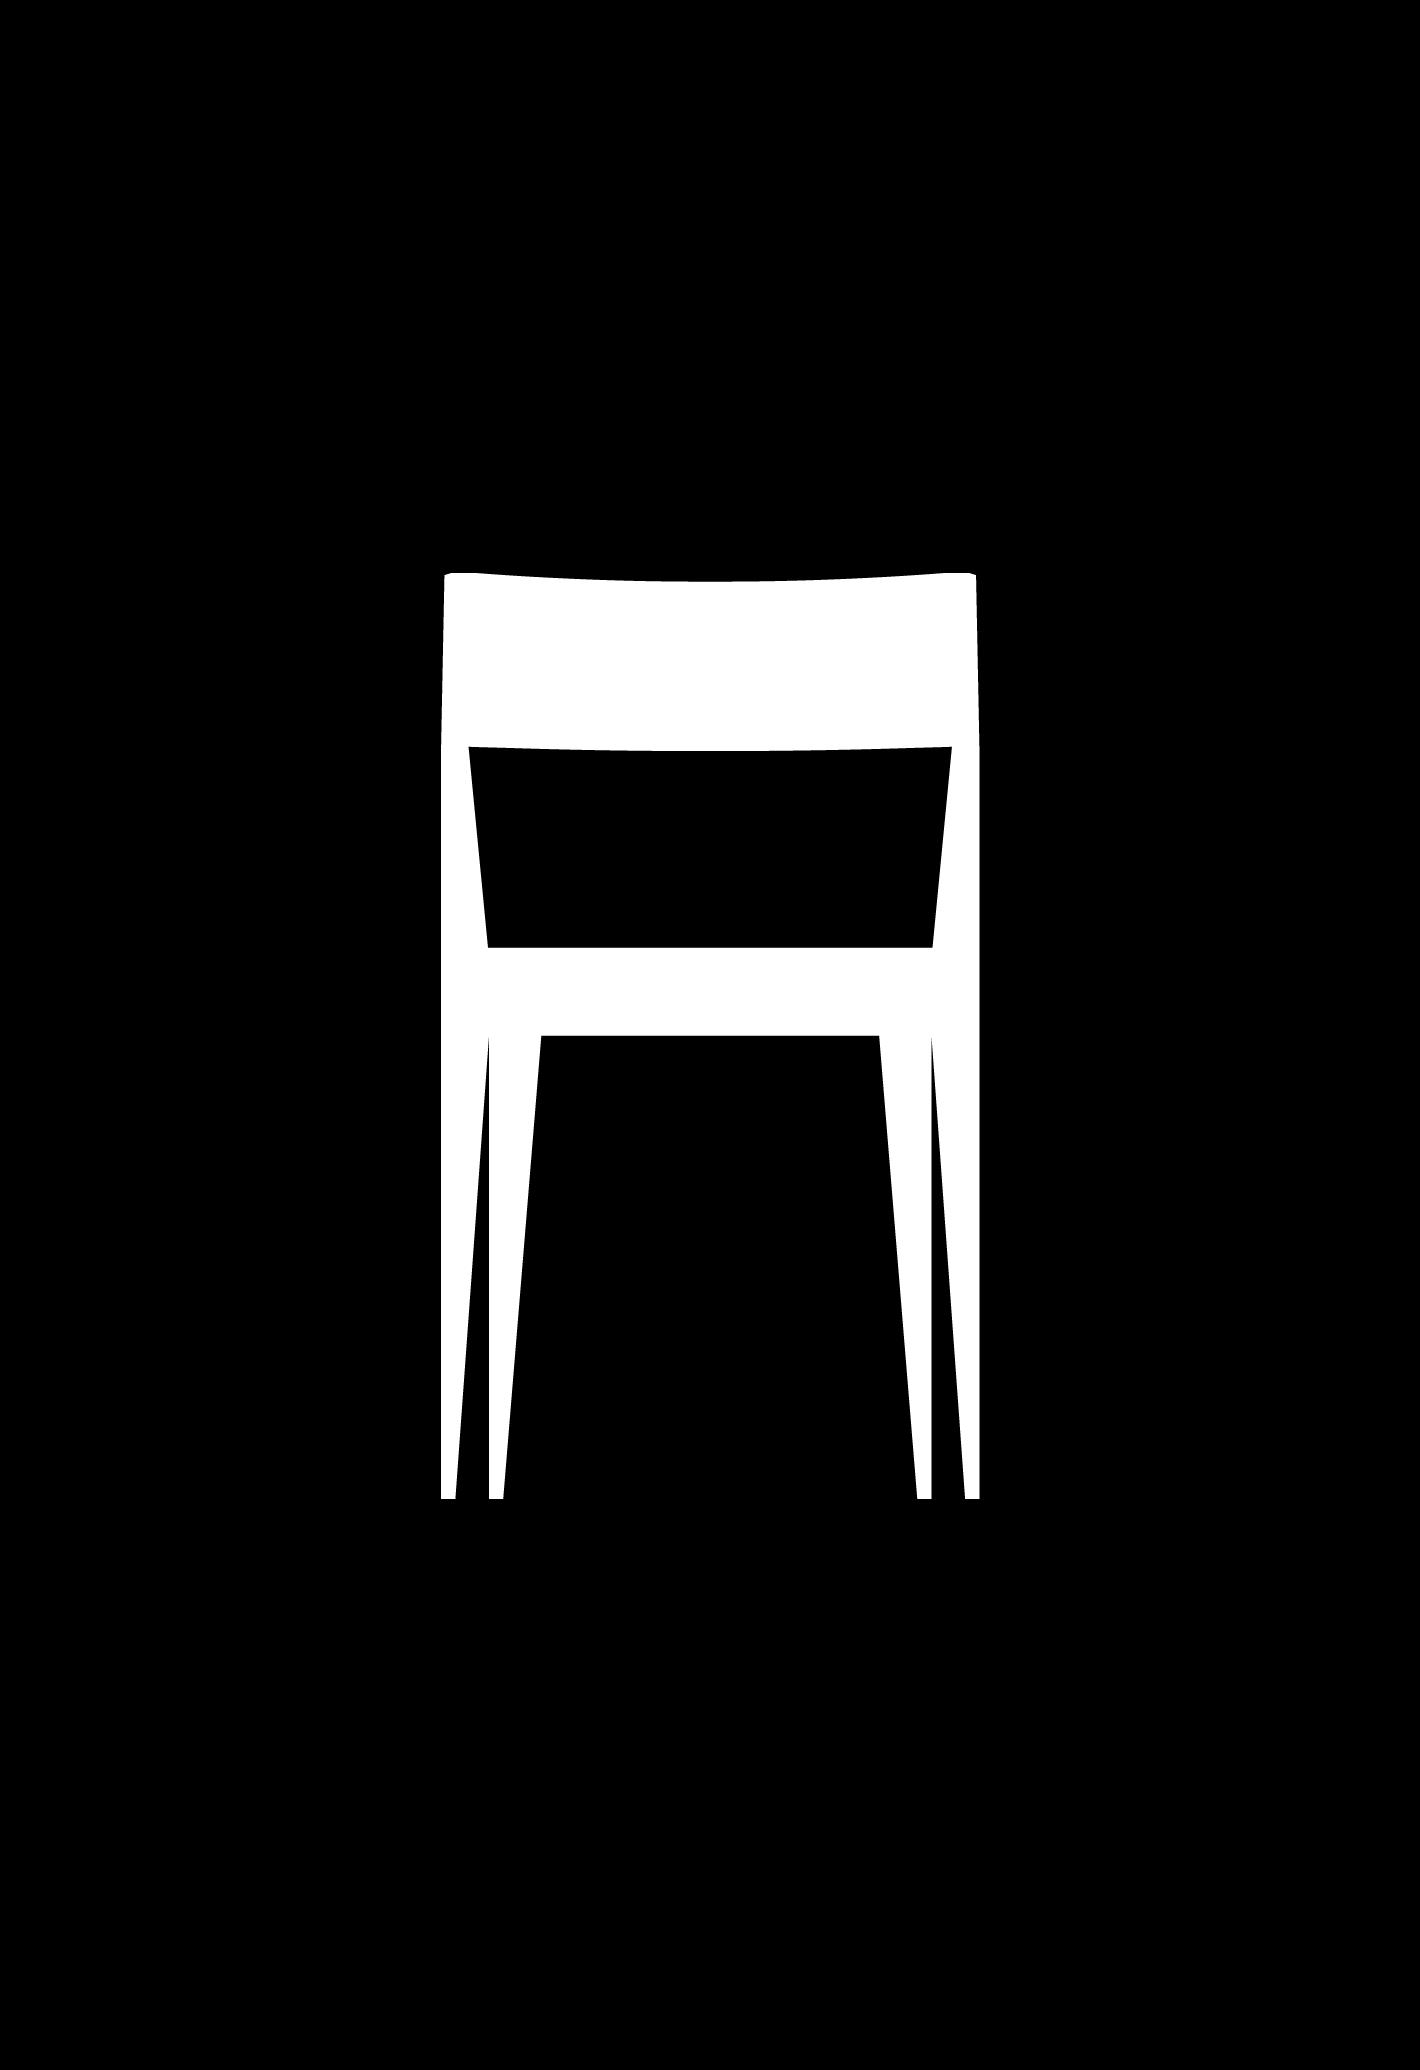 sedia / chair ARAGOSTA - Studiocharlie - Billiani - Carla scorda - Gabriele Rigamonti - Vittorio Turla